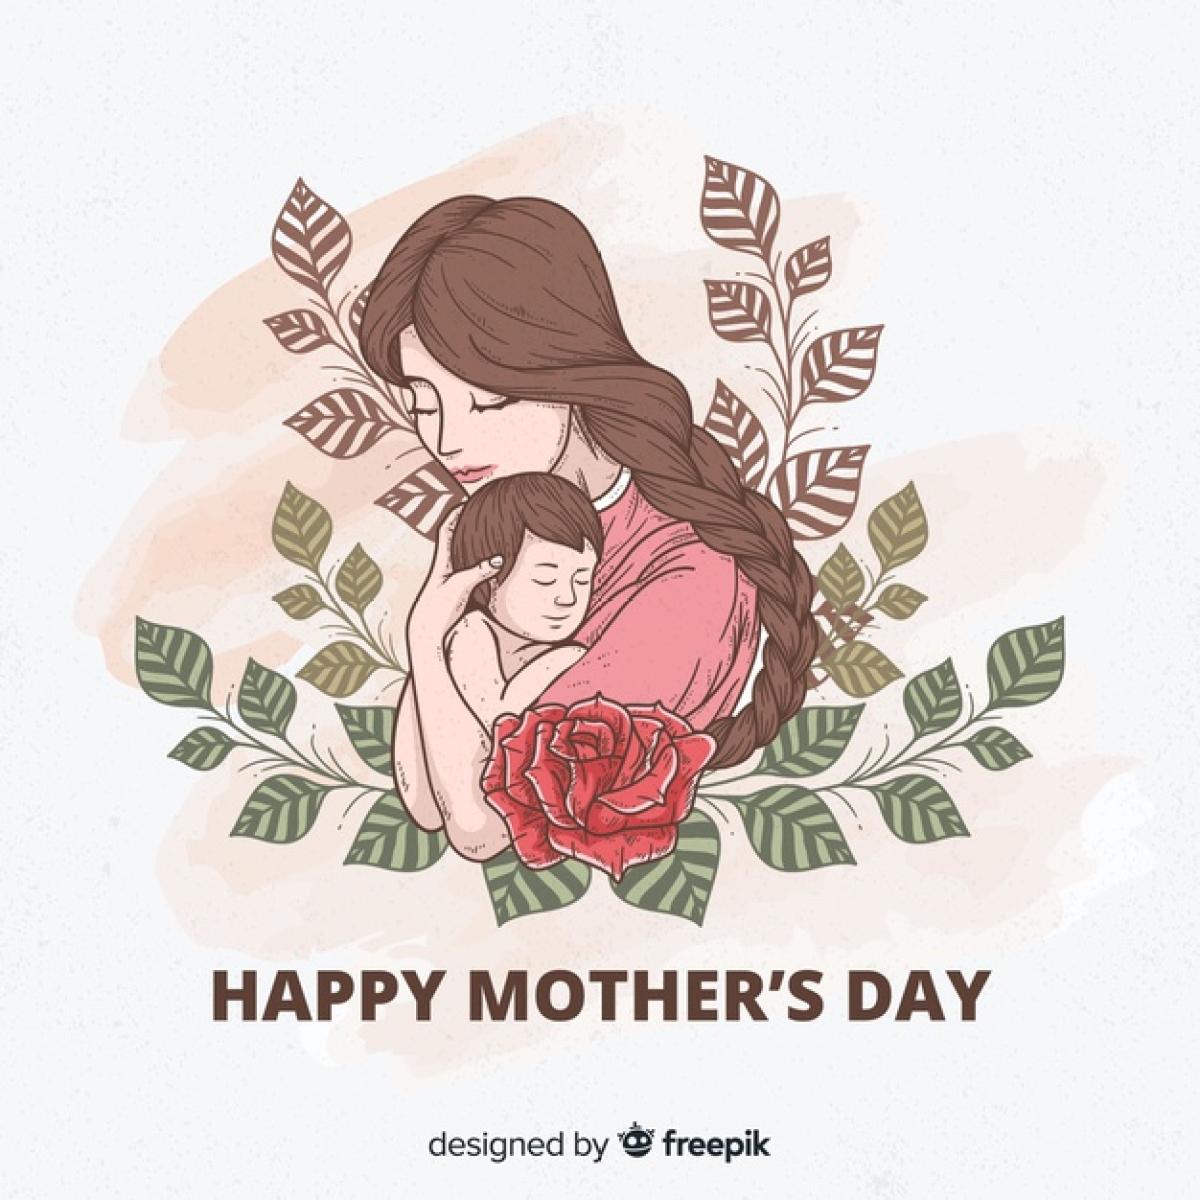 Mother's Day 2020: Inspiring stories of corona warriors moms